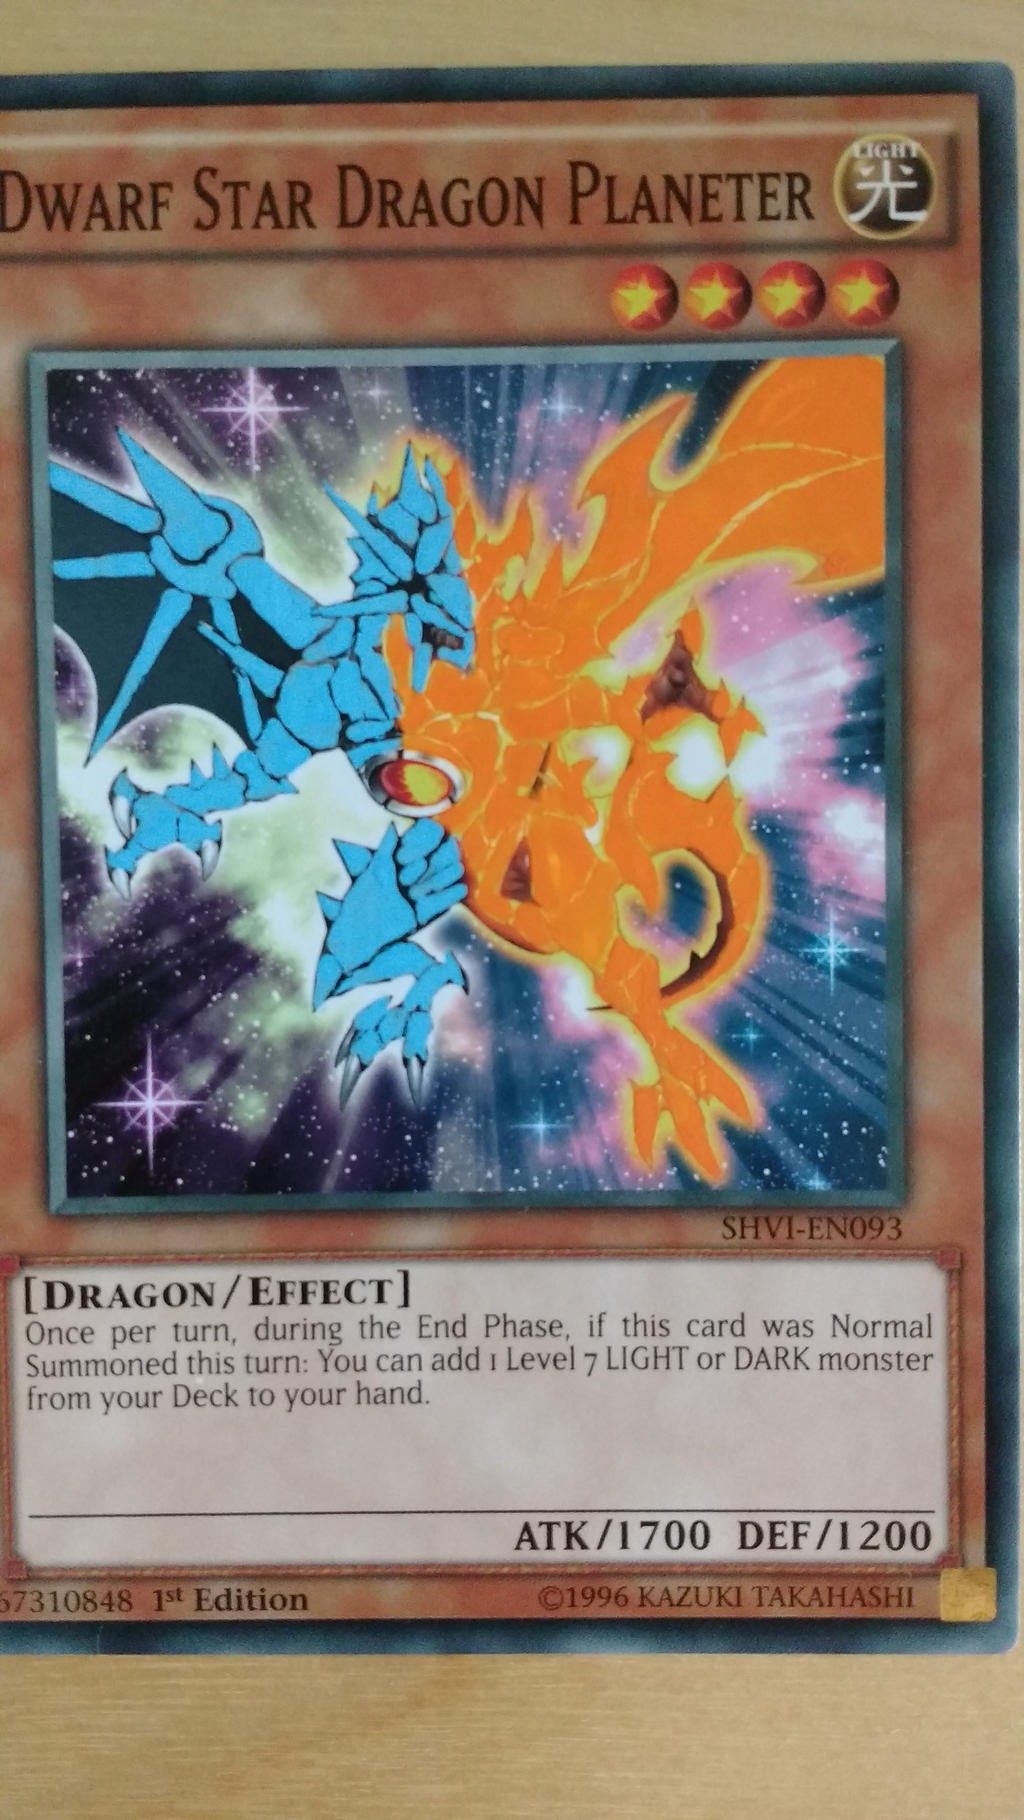 yu gi oh altered art dwarf star dragon planeter by ultimate lol